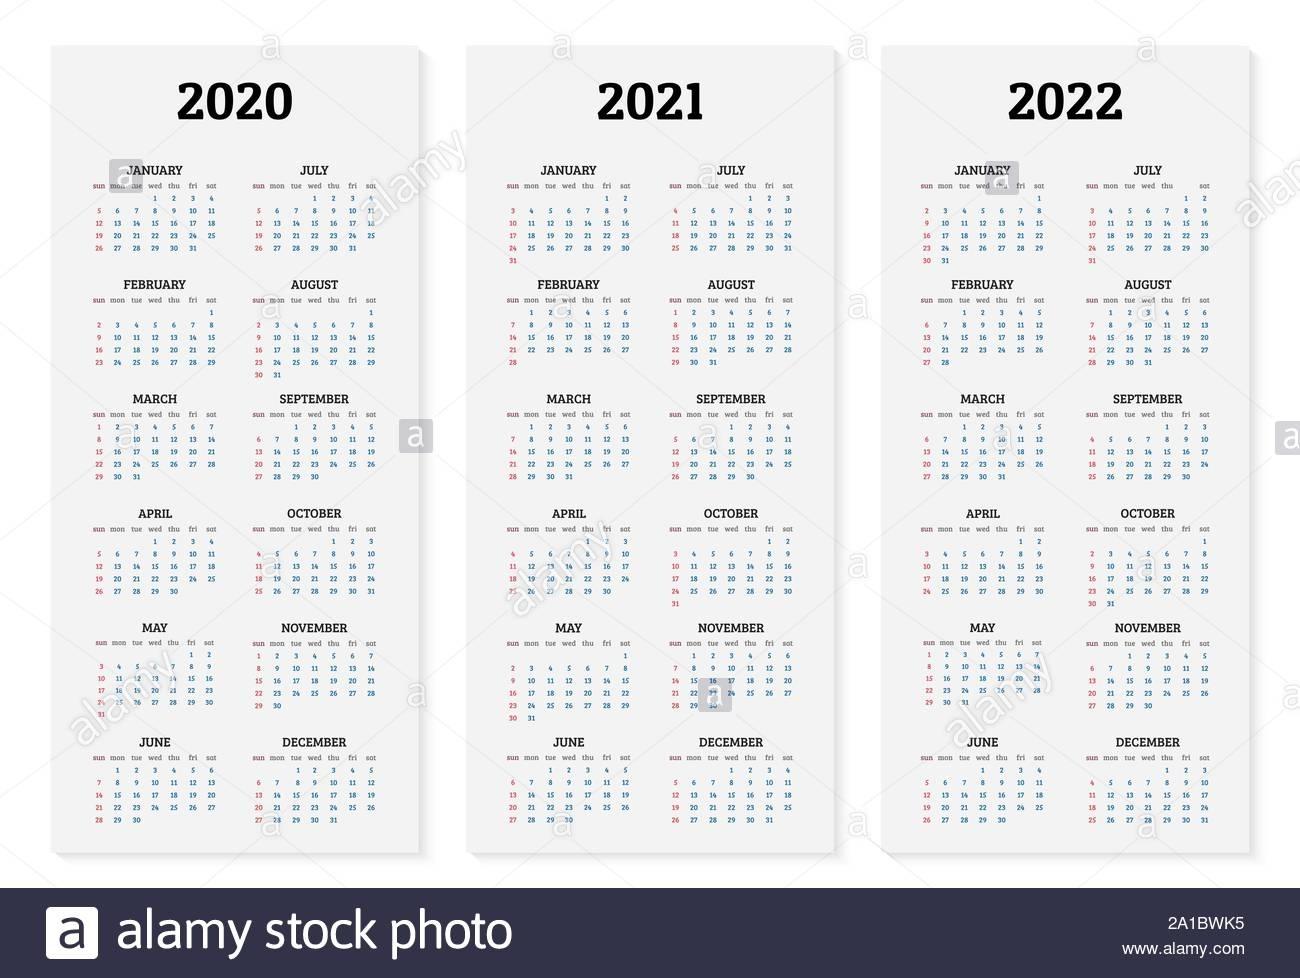 Annual Calendar 2020, 2021 And 2022 Template. Vector within Printable Calendar 2020 2021 2022